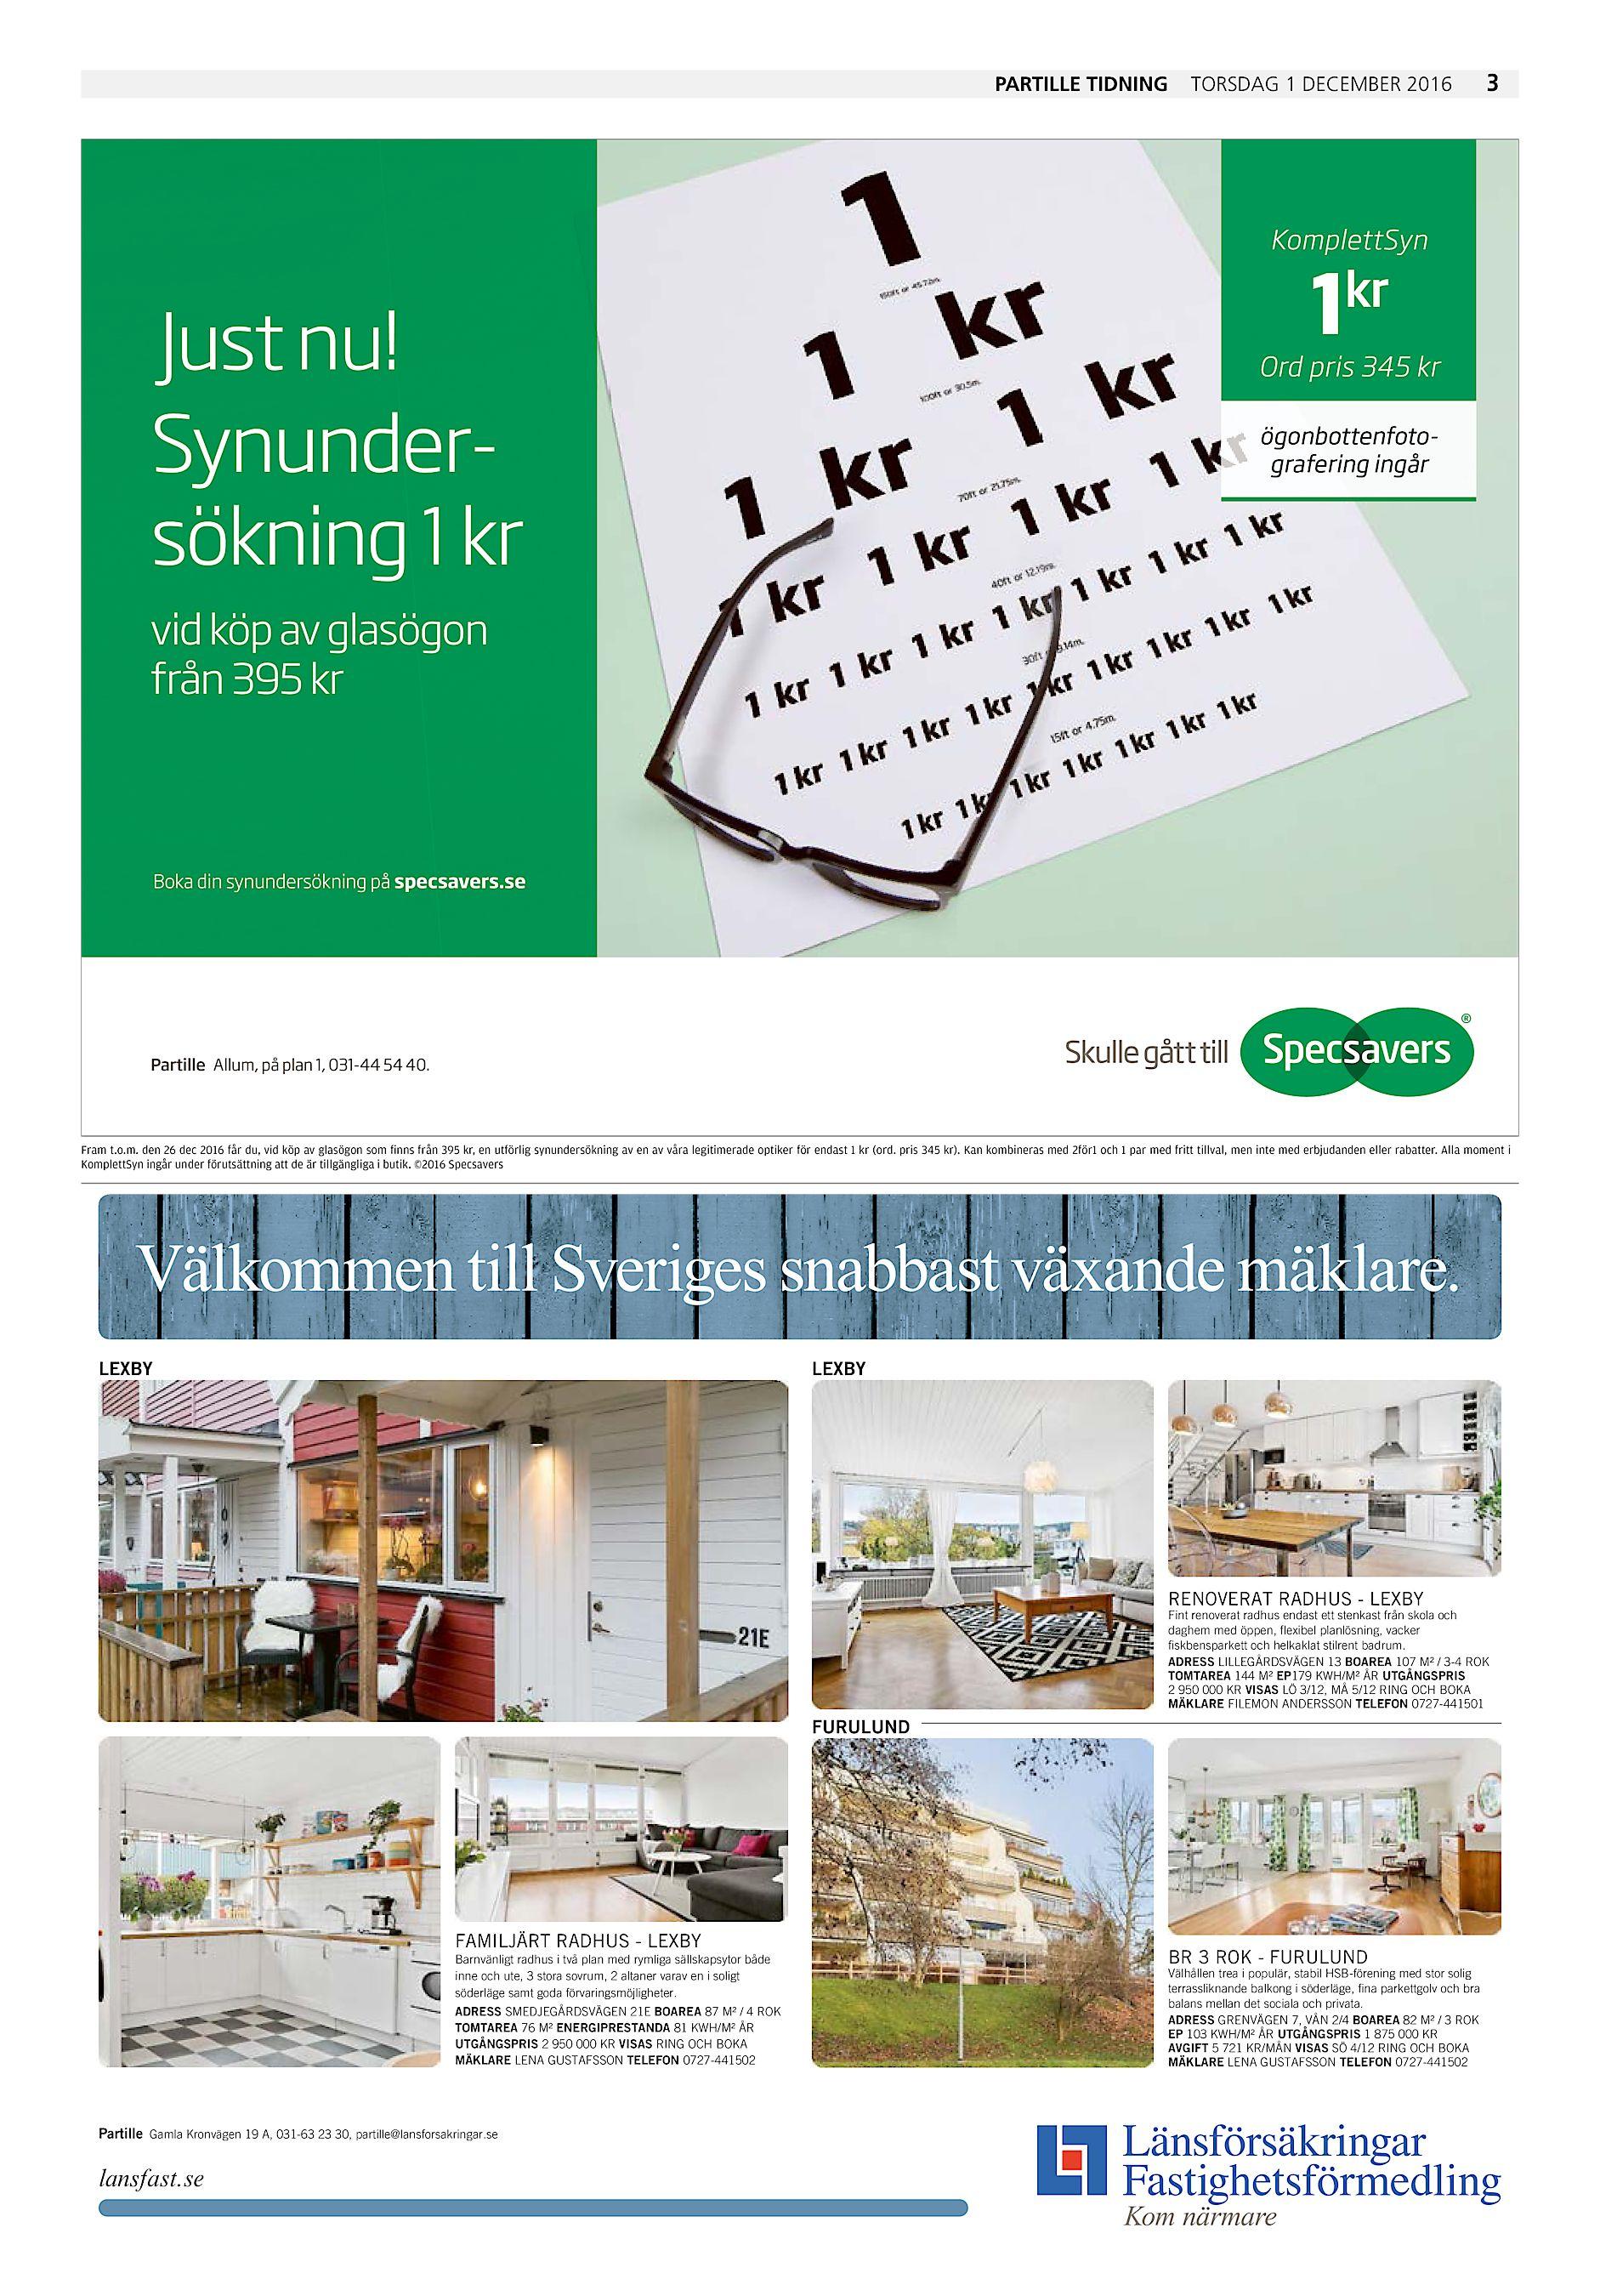 Martin Svensson, Hobyvgen 45, Furulund | redteksystems.net